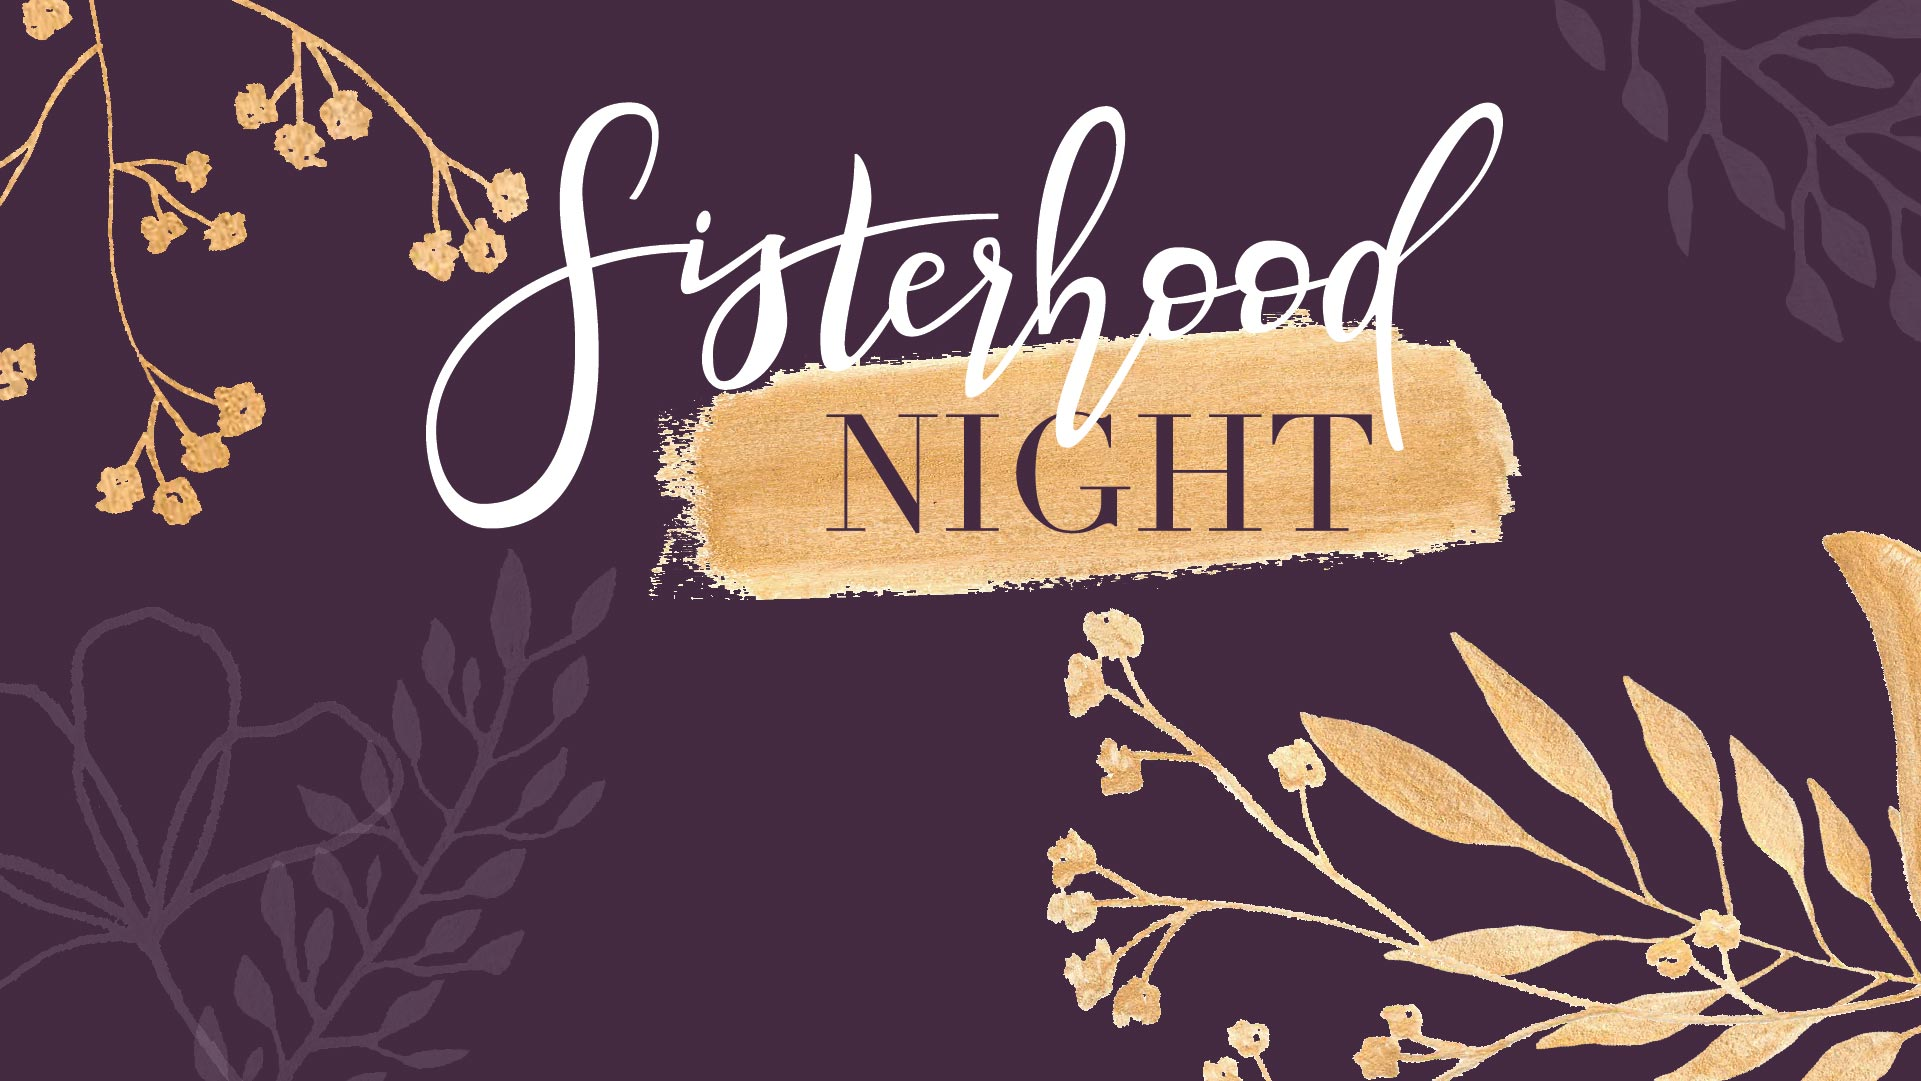 Screen Graphics_1920x1080_Sisterhood Night